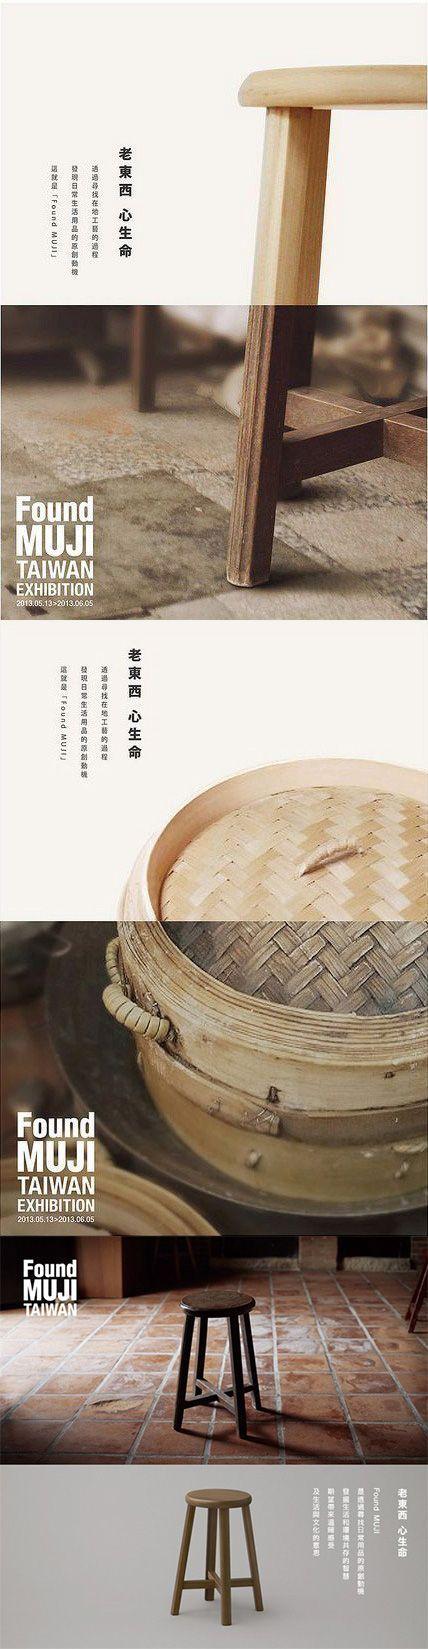 (37) // 2013 FOUND MUJI TAIWAN \ | ∴ Graphic Design | Pinterest